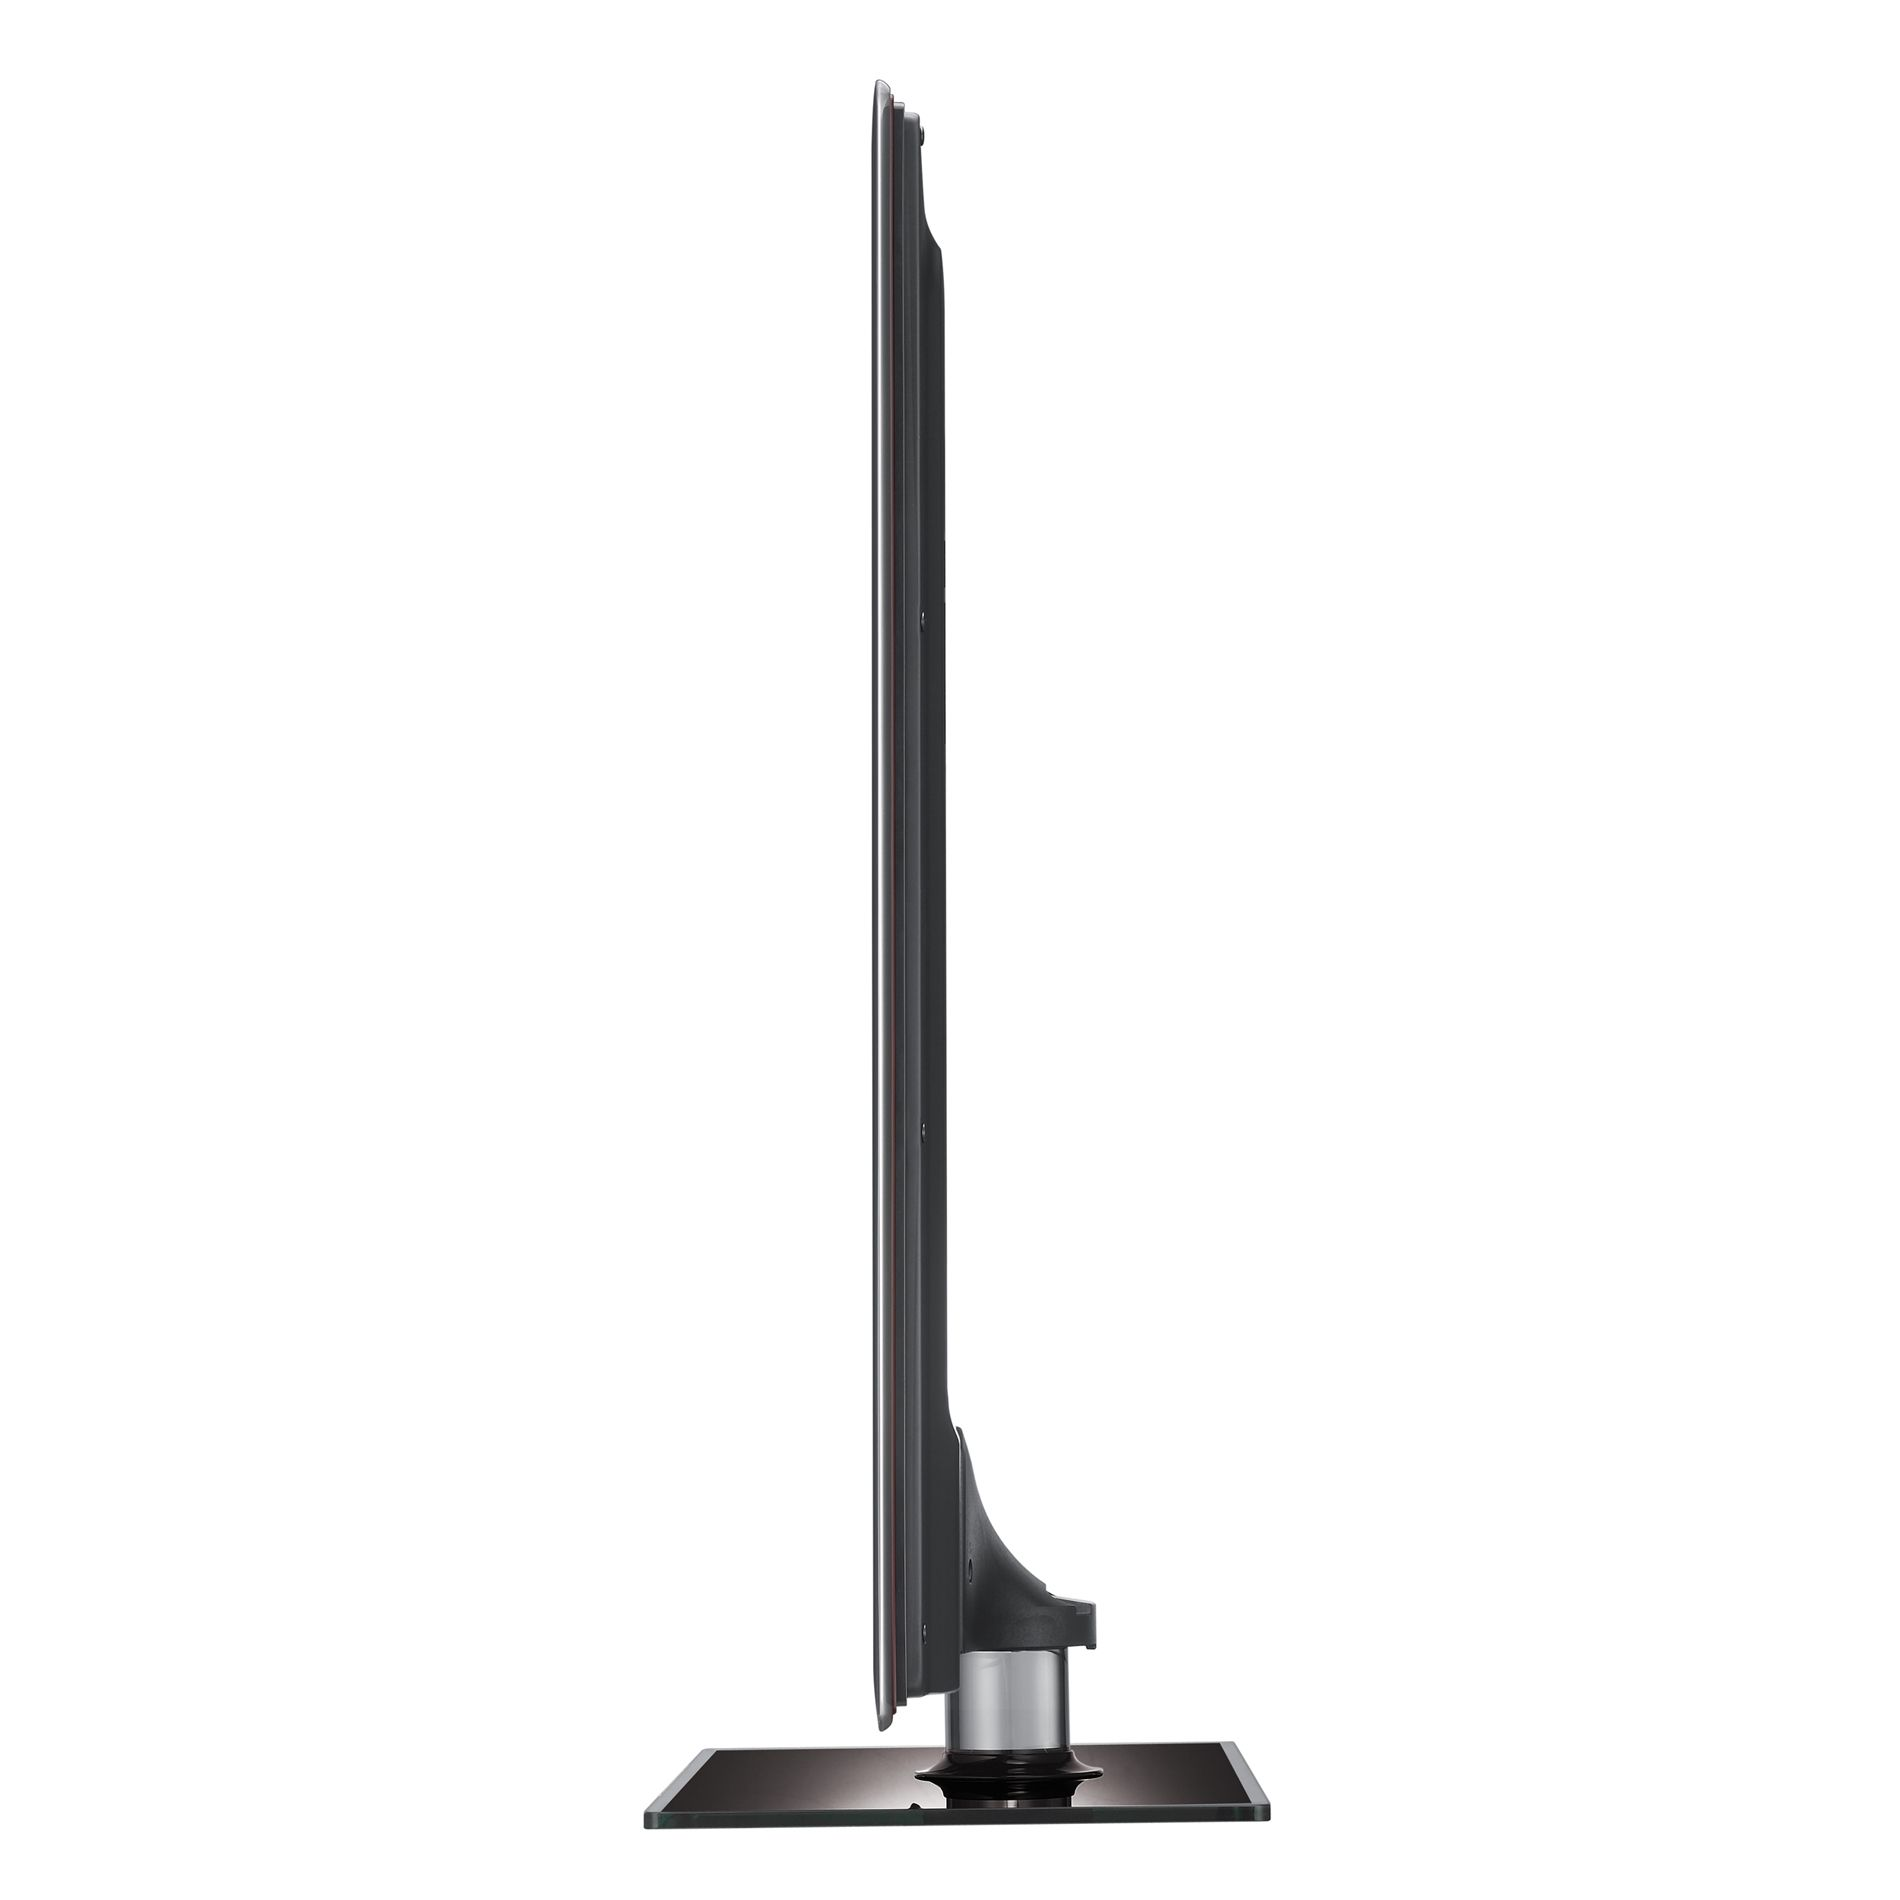 "Samsung 60"" Class LED HDTV with 1080p UN60D6000"